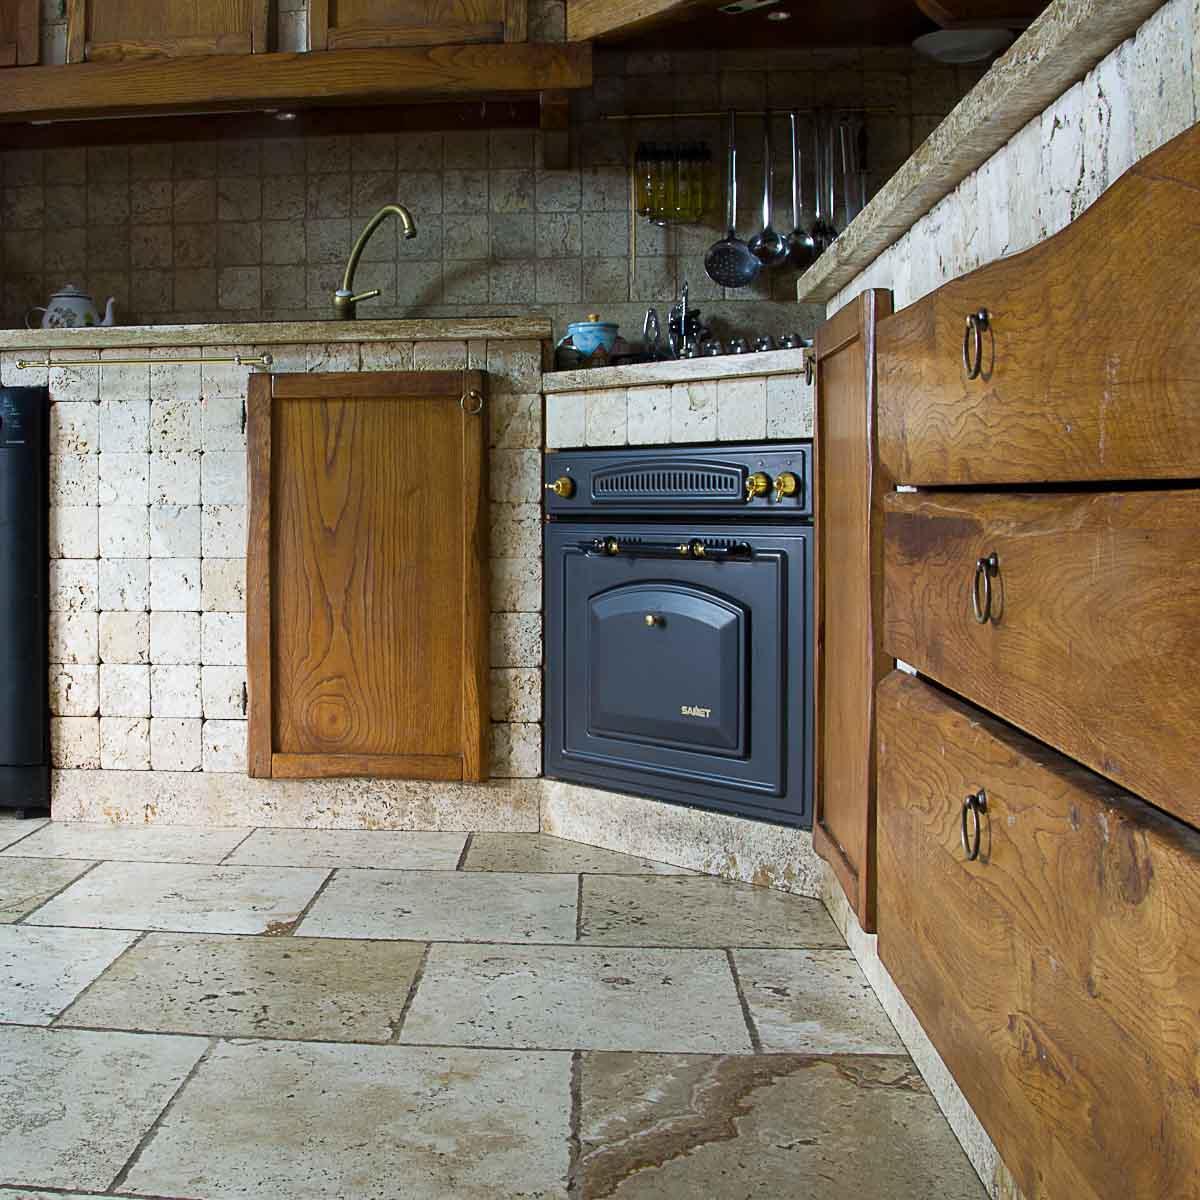 Bagni rustici in legno bagno in pietra with bagni rustici - Bagni esterni in legno ...